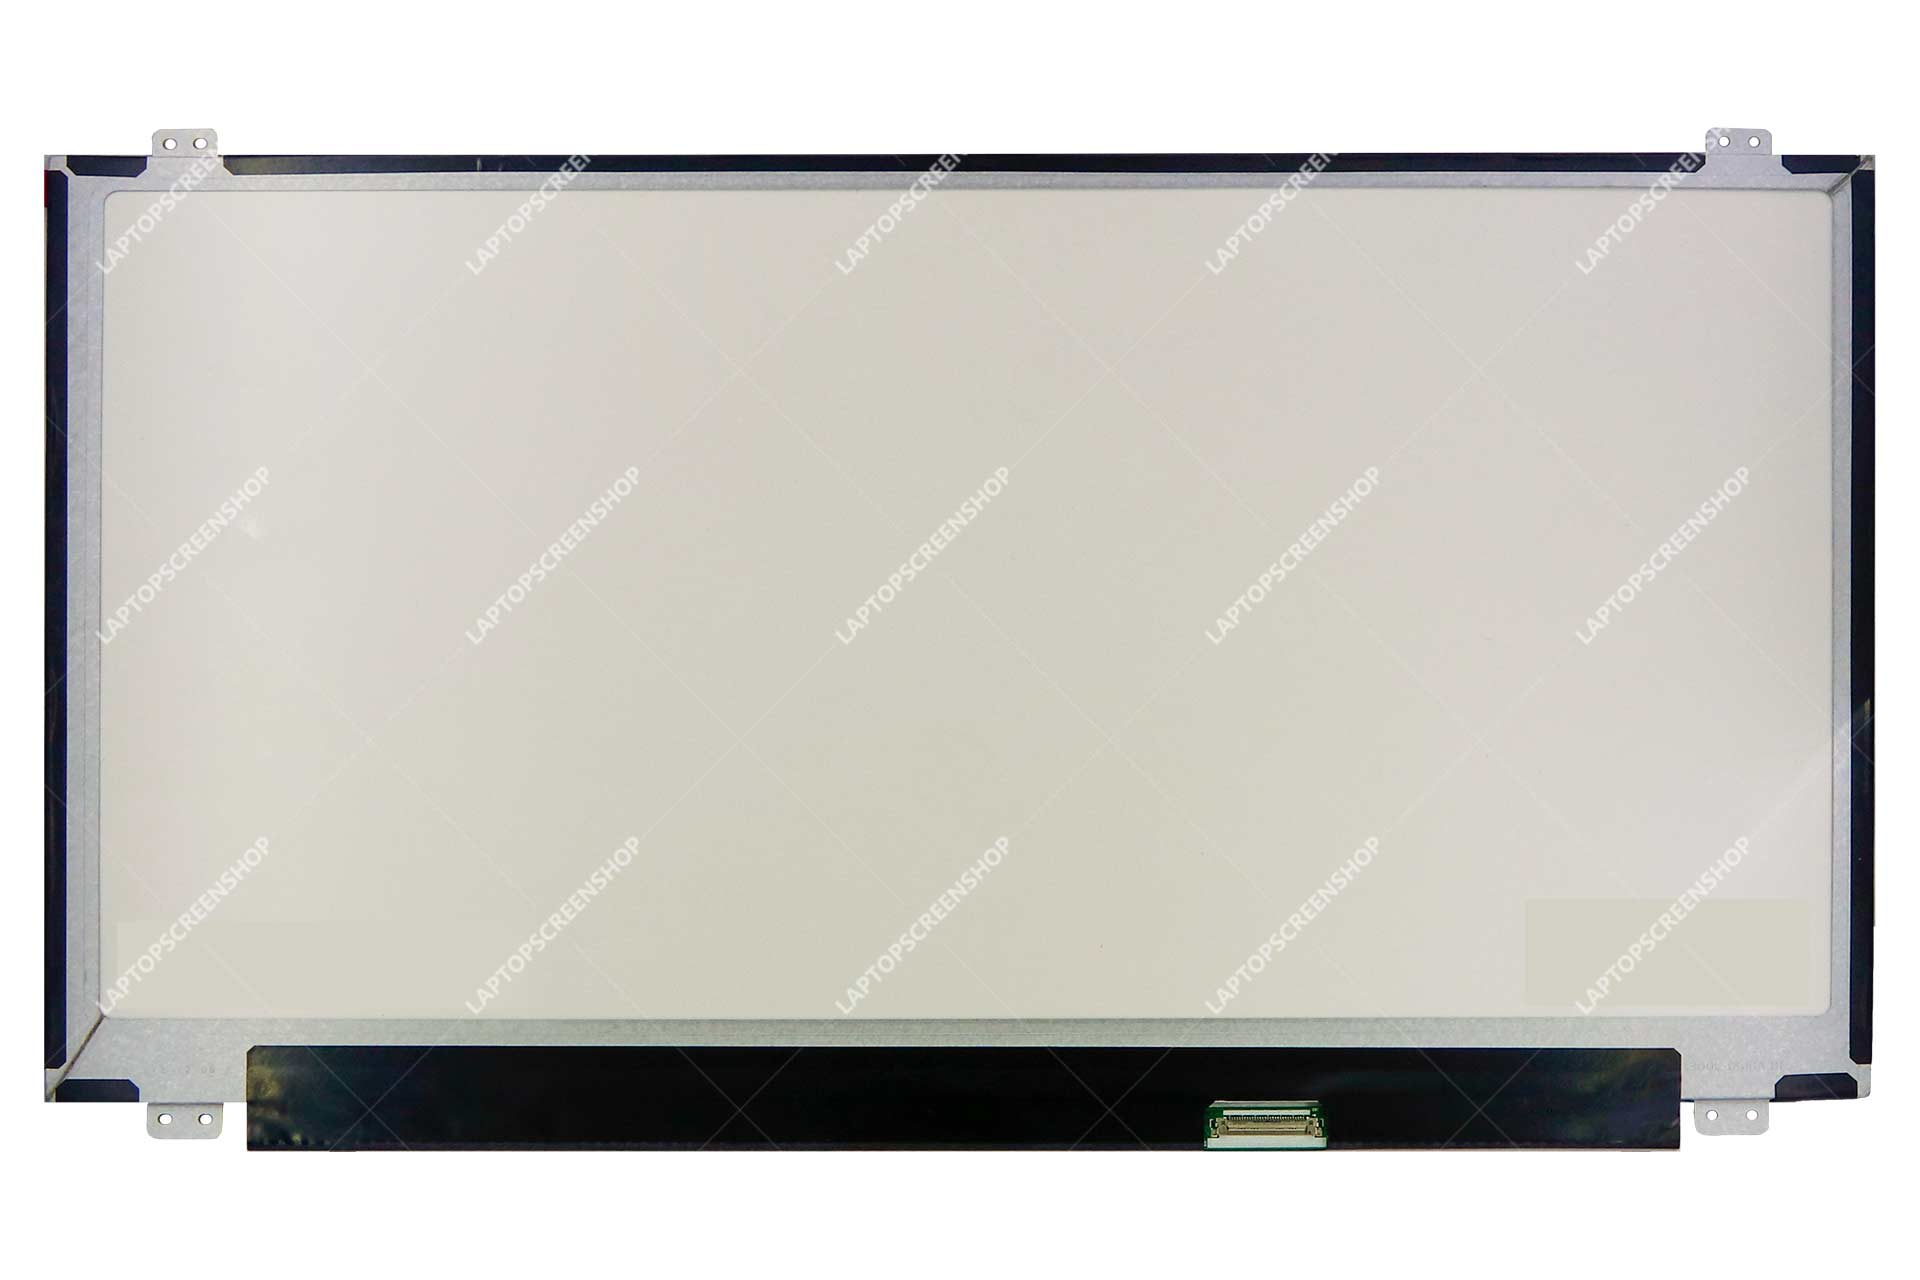 ACER-ASPIRE-E1-422G-SERIES-LCD-LCD |HD|فروشگاه لپ تاپ اسکرين | تعمير لپ تاپ